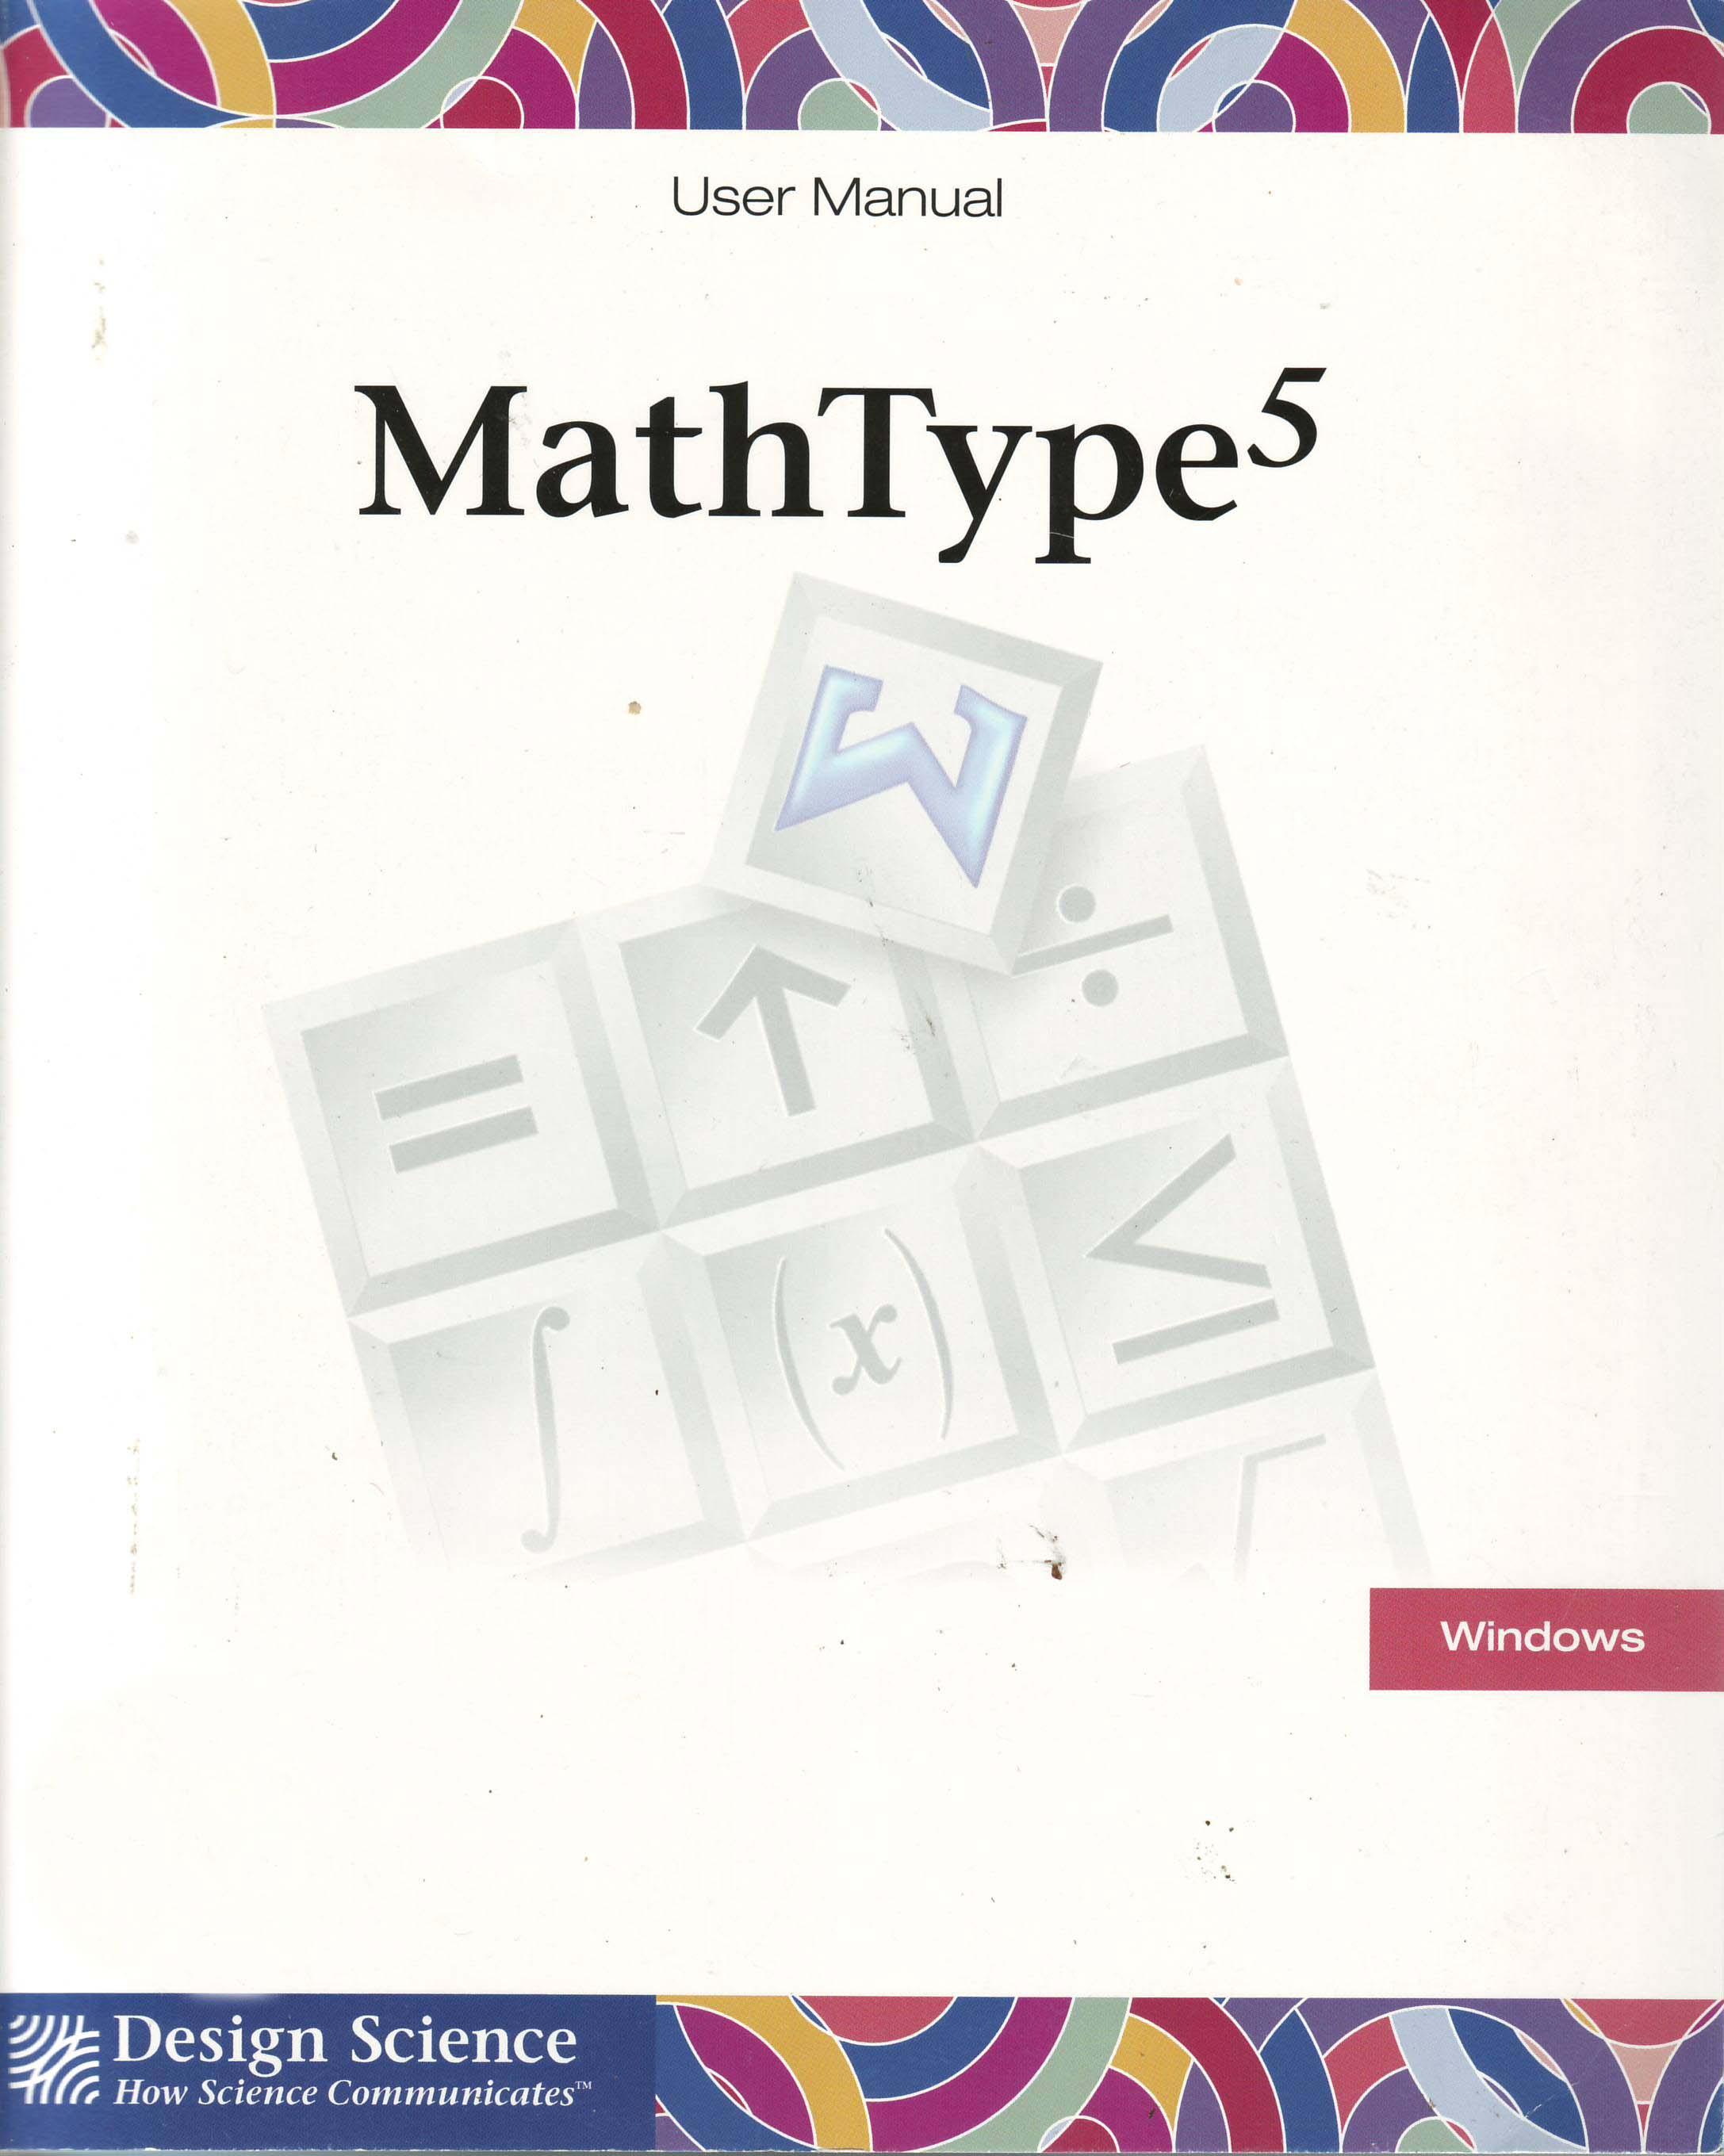 MathType 5 - User Manual